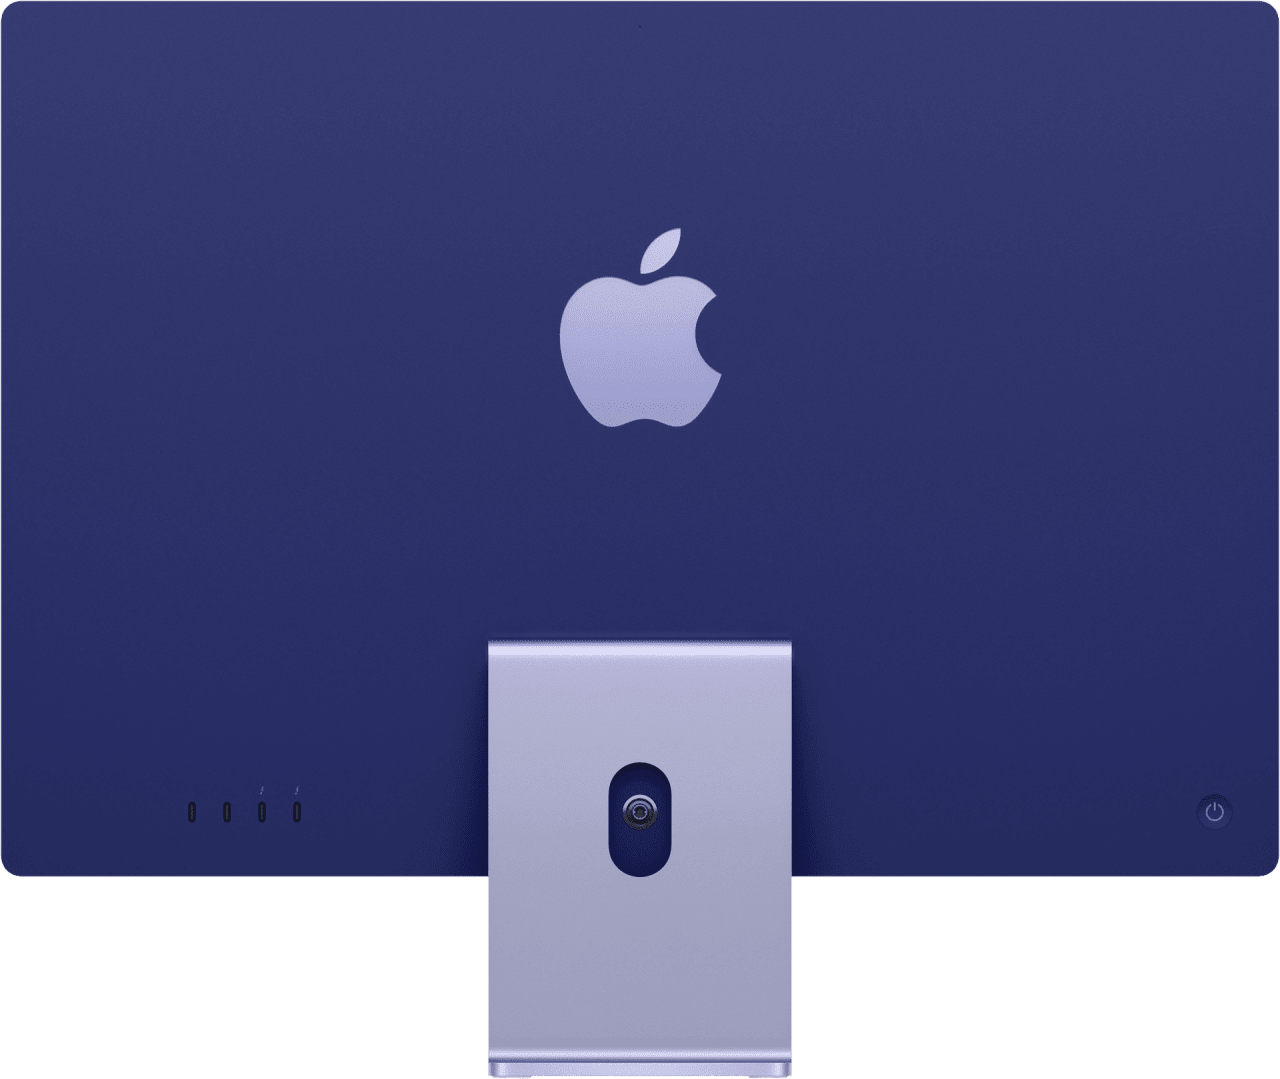 "Violett Apple 24"" iMac (Mid 2021) - English (QWERTY) All-in-One PC - Apple M1 - 16GB - 512GB SSD - Apple Integrated 8-core GPU.2"